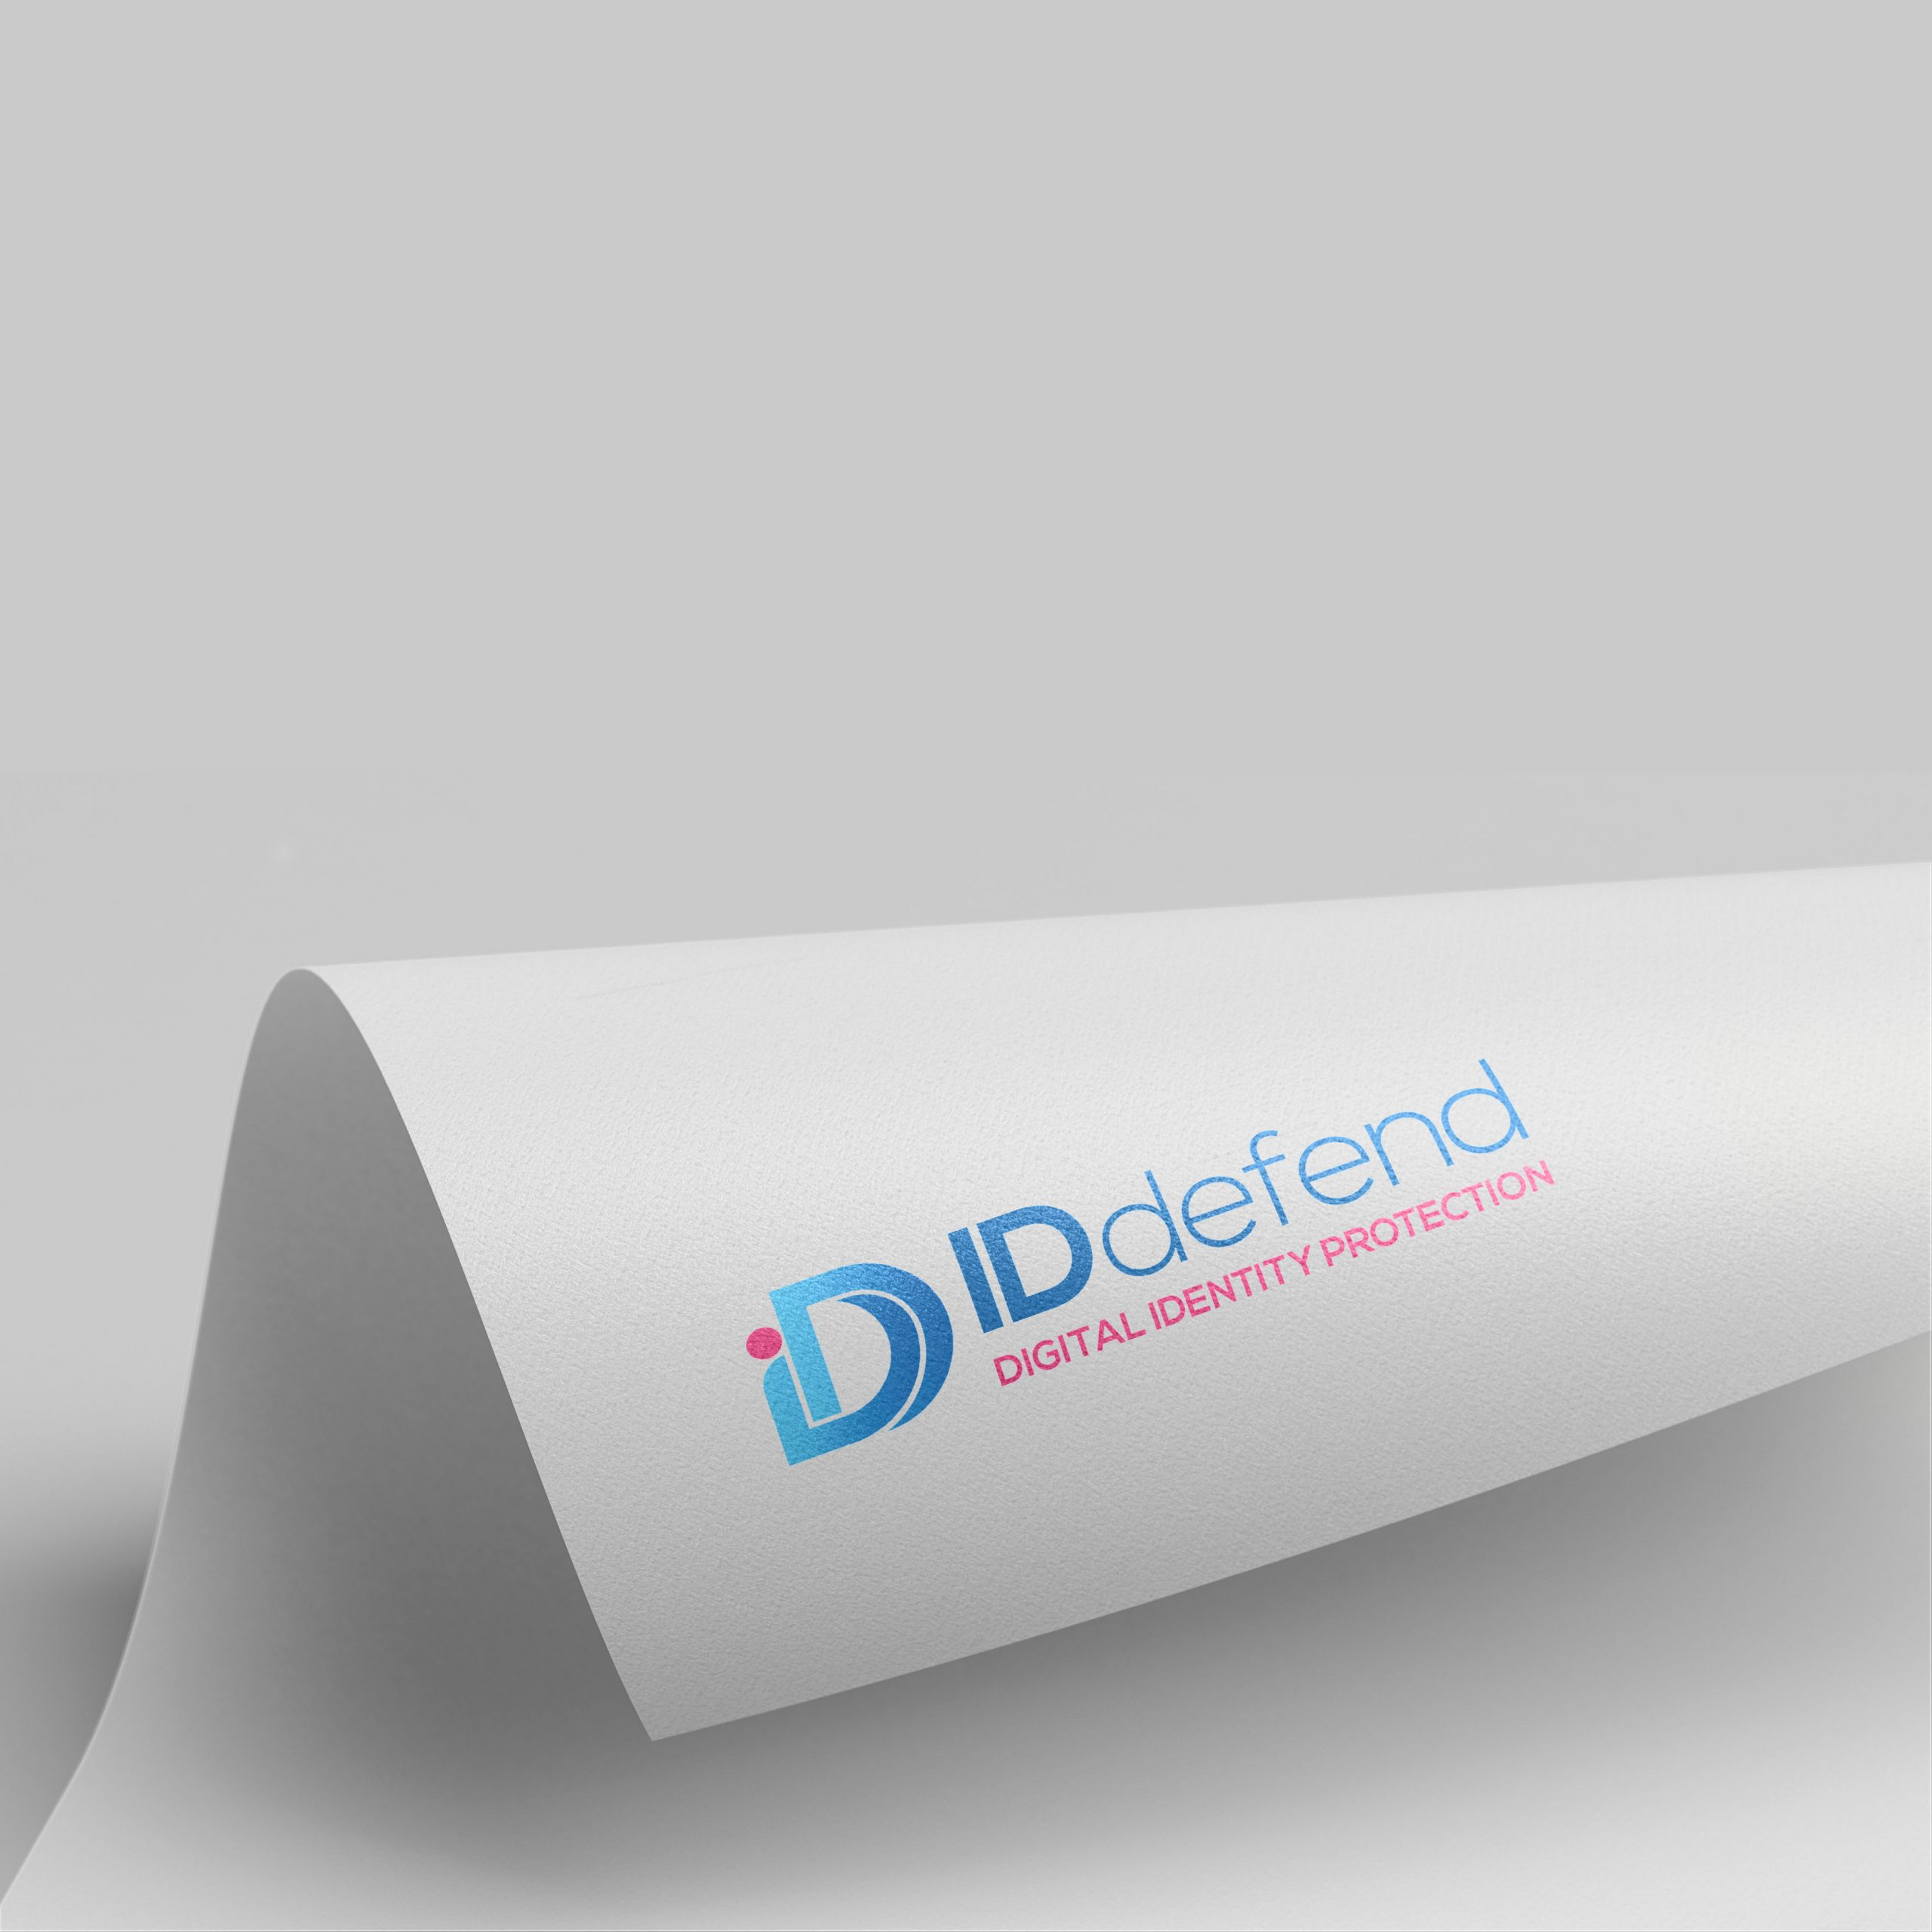 ID Defend